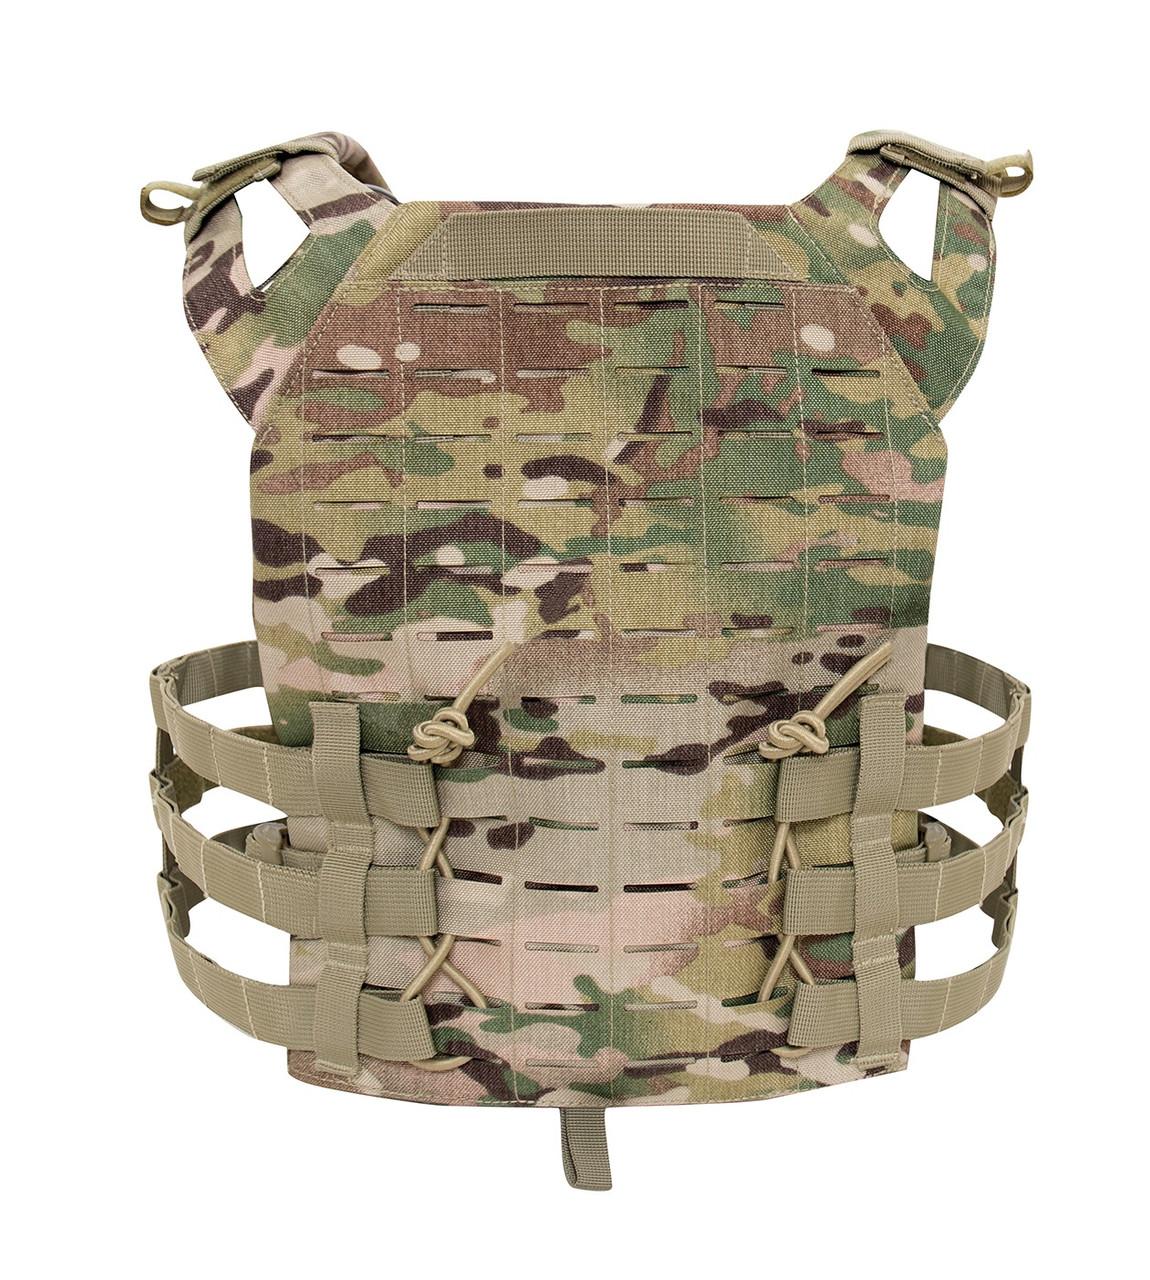 Laser Cut Lightweight Armor Carrier MOLLE Vest -MultiCam